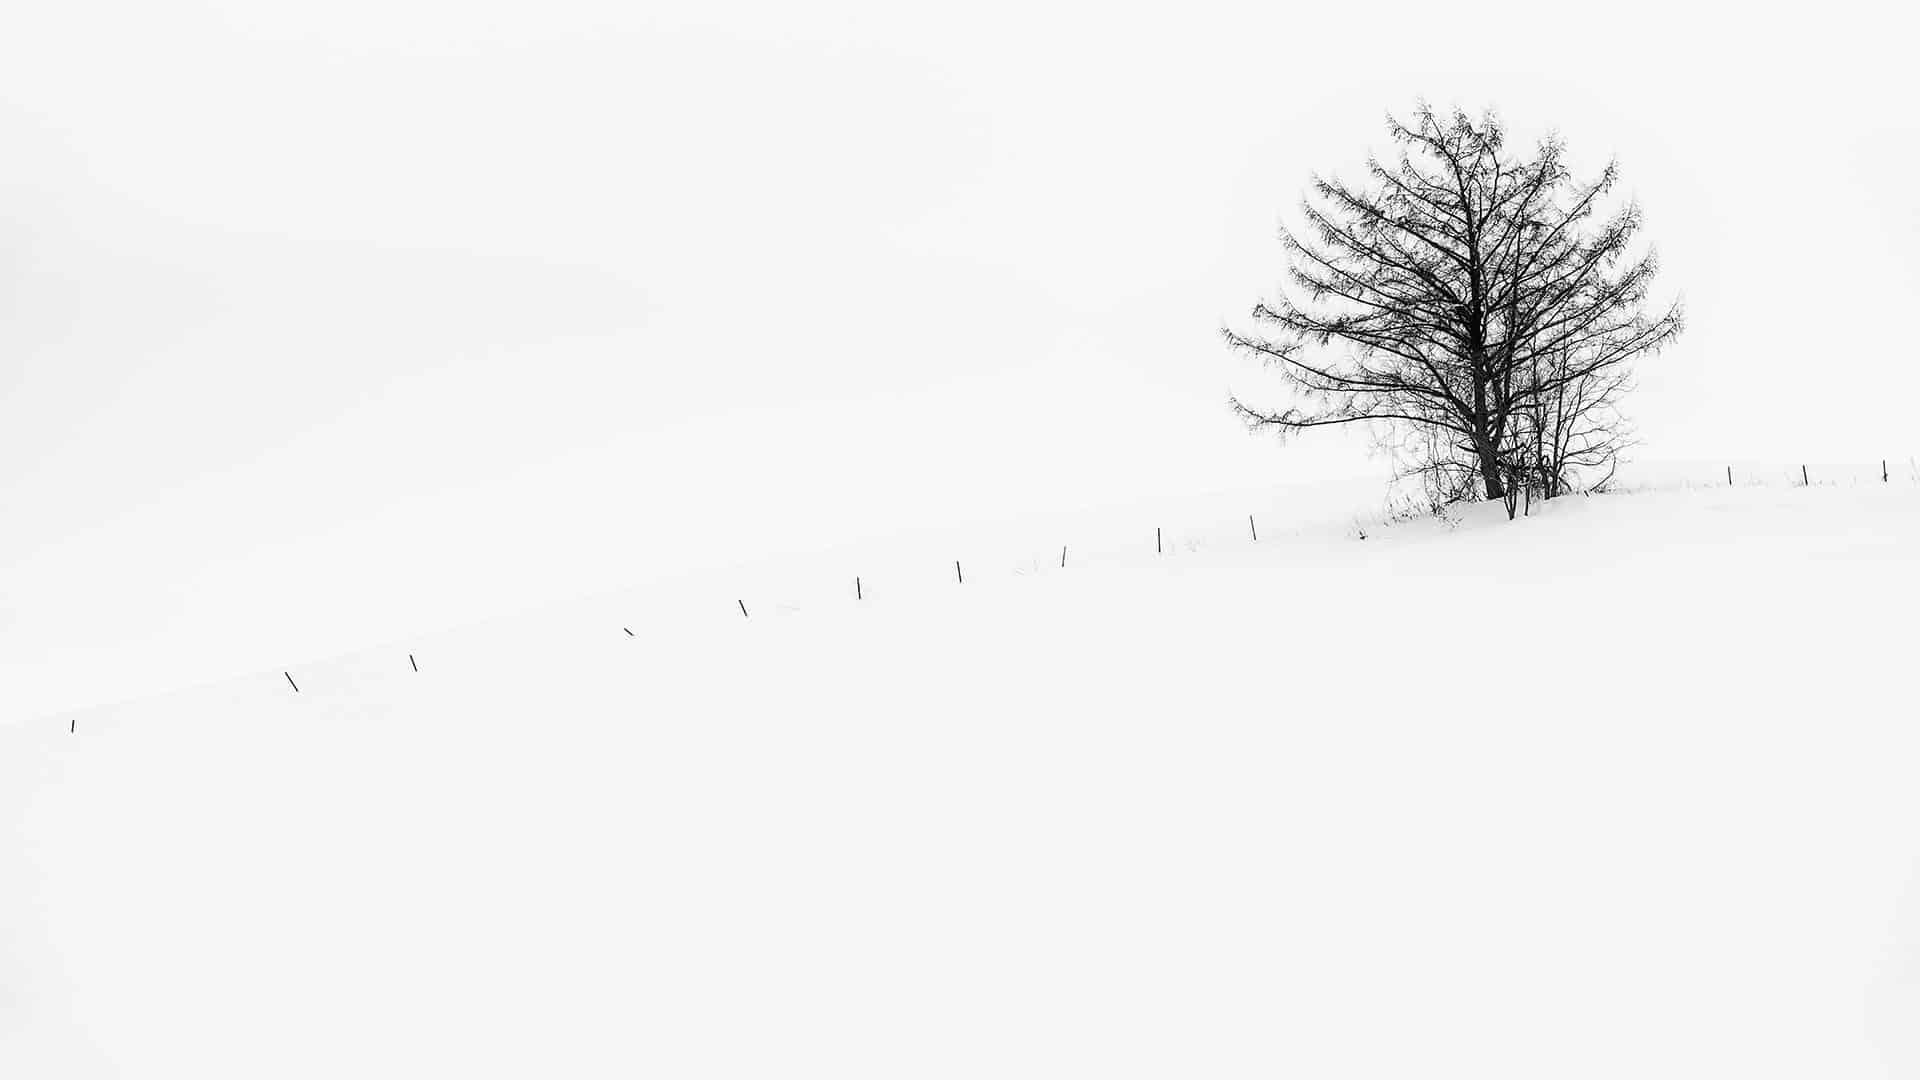 Hokkaido Landscape Photography Adventure